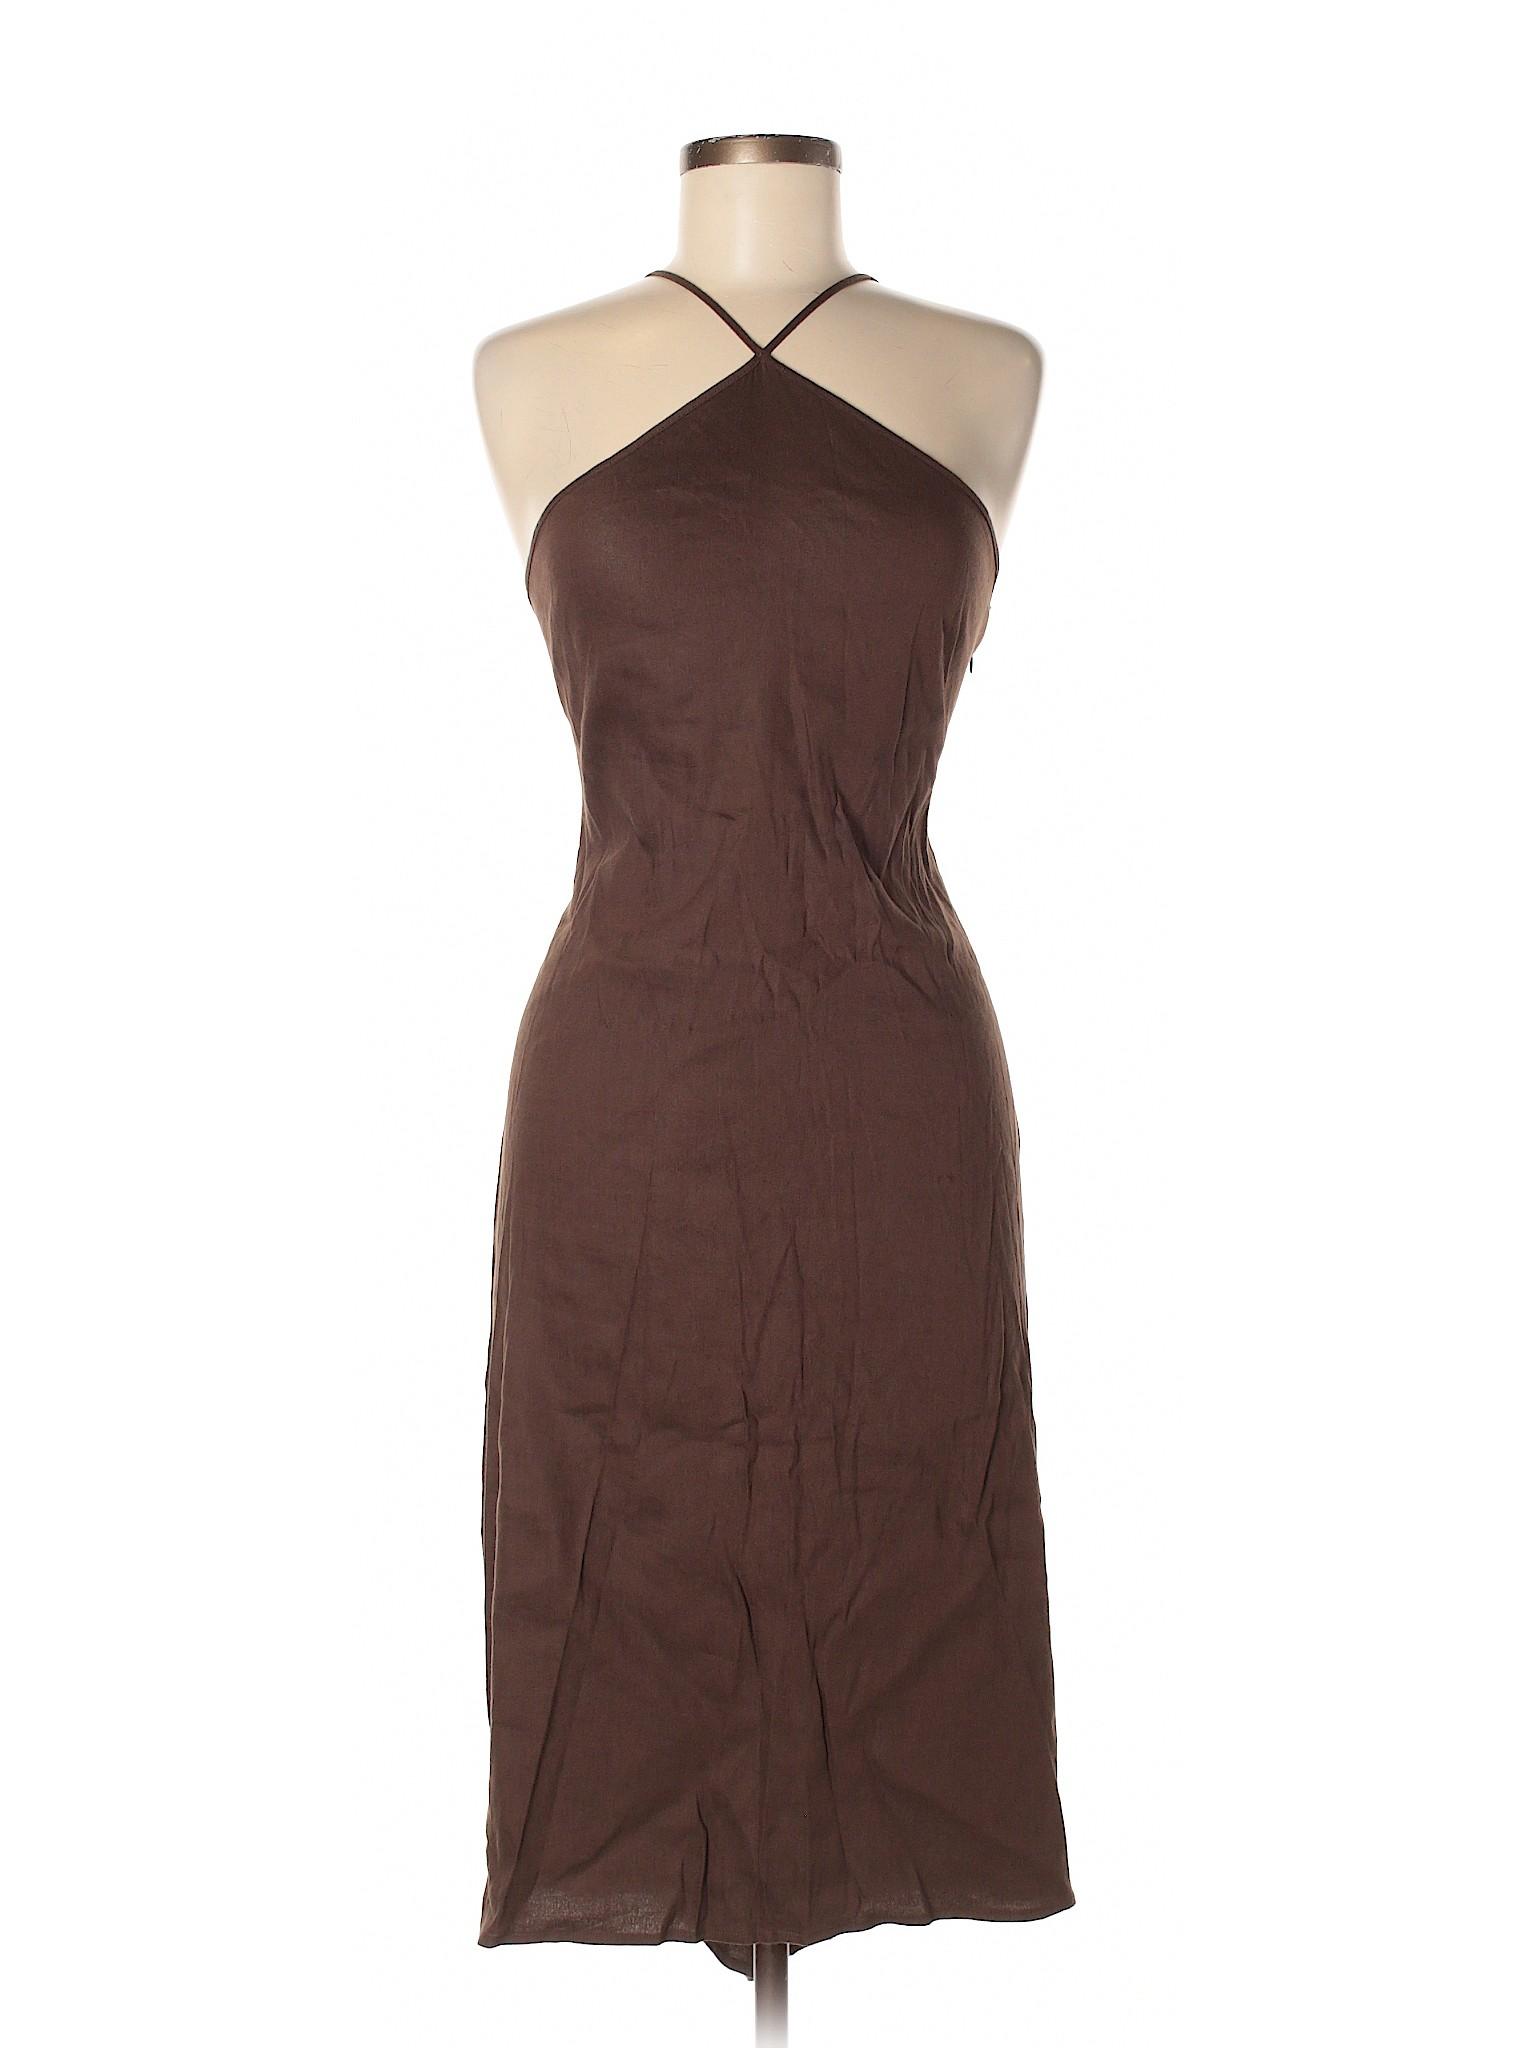 Selling Dress Selling BCBGMAXAZRIA Casual BCBGMAXAZRIA da4Hd